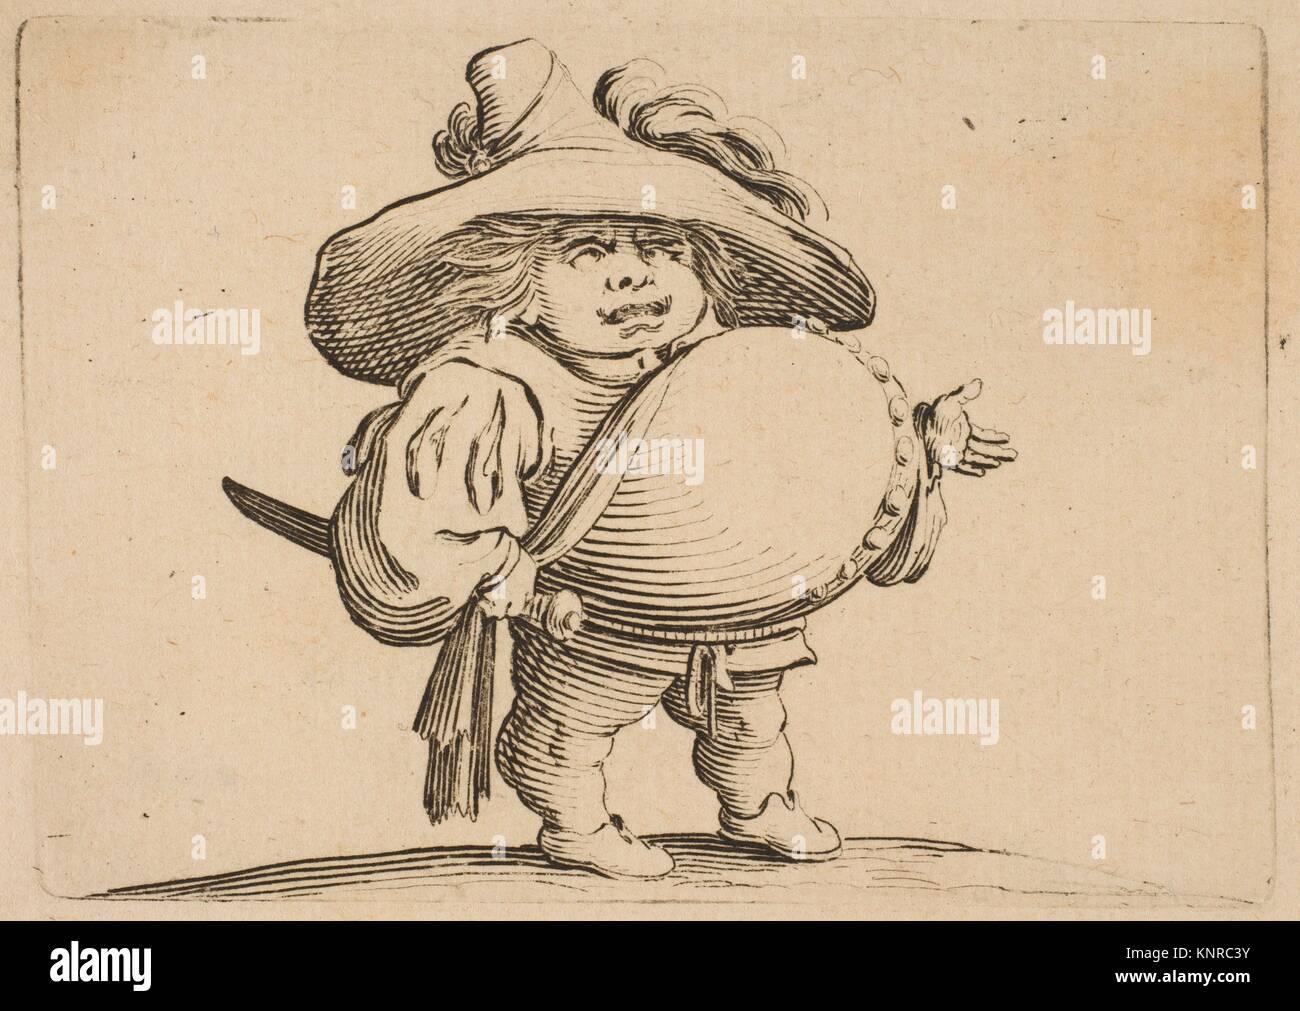 L'Homme au Gros Ventre Orné d'une Rangée de Boutons (Man with a Large Belly Decorated with a Row - Stock Image